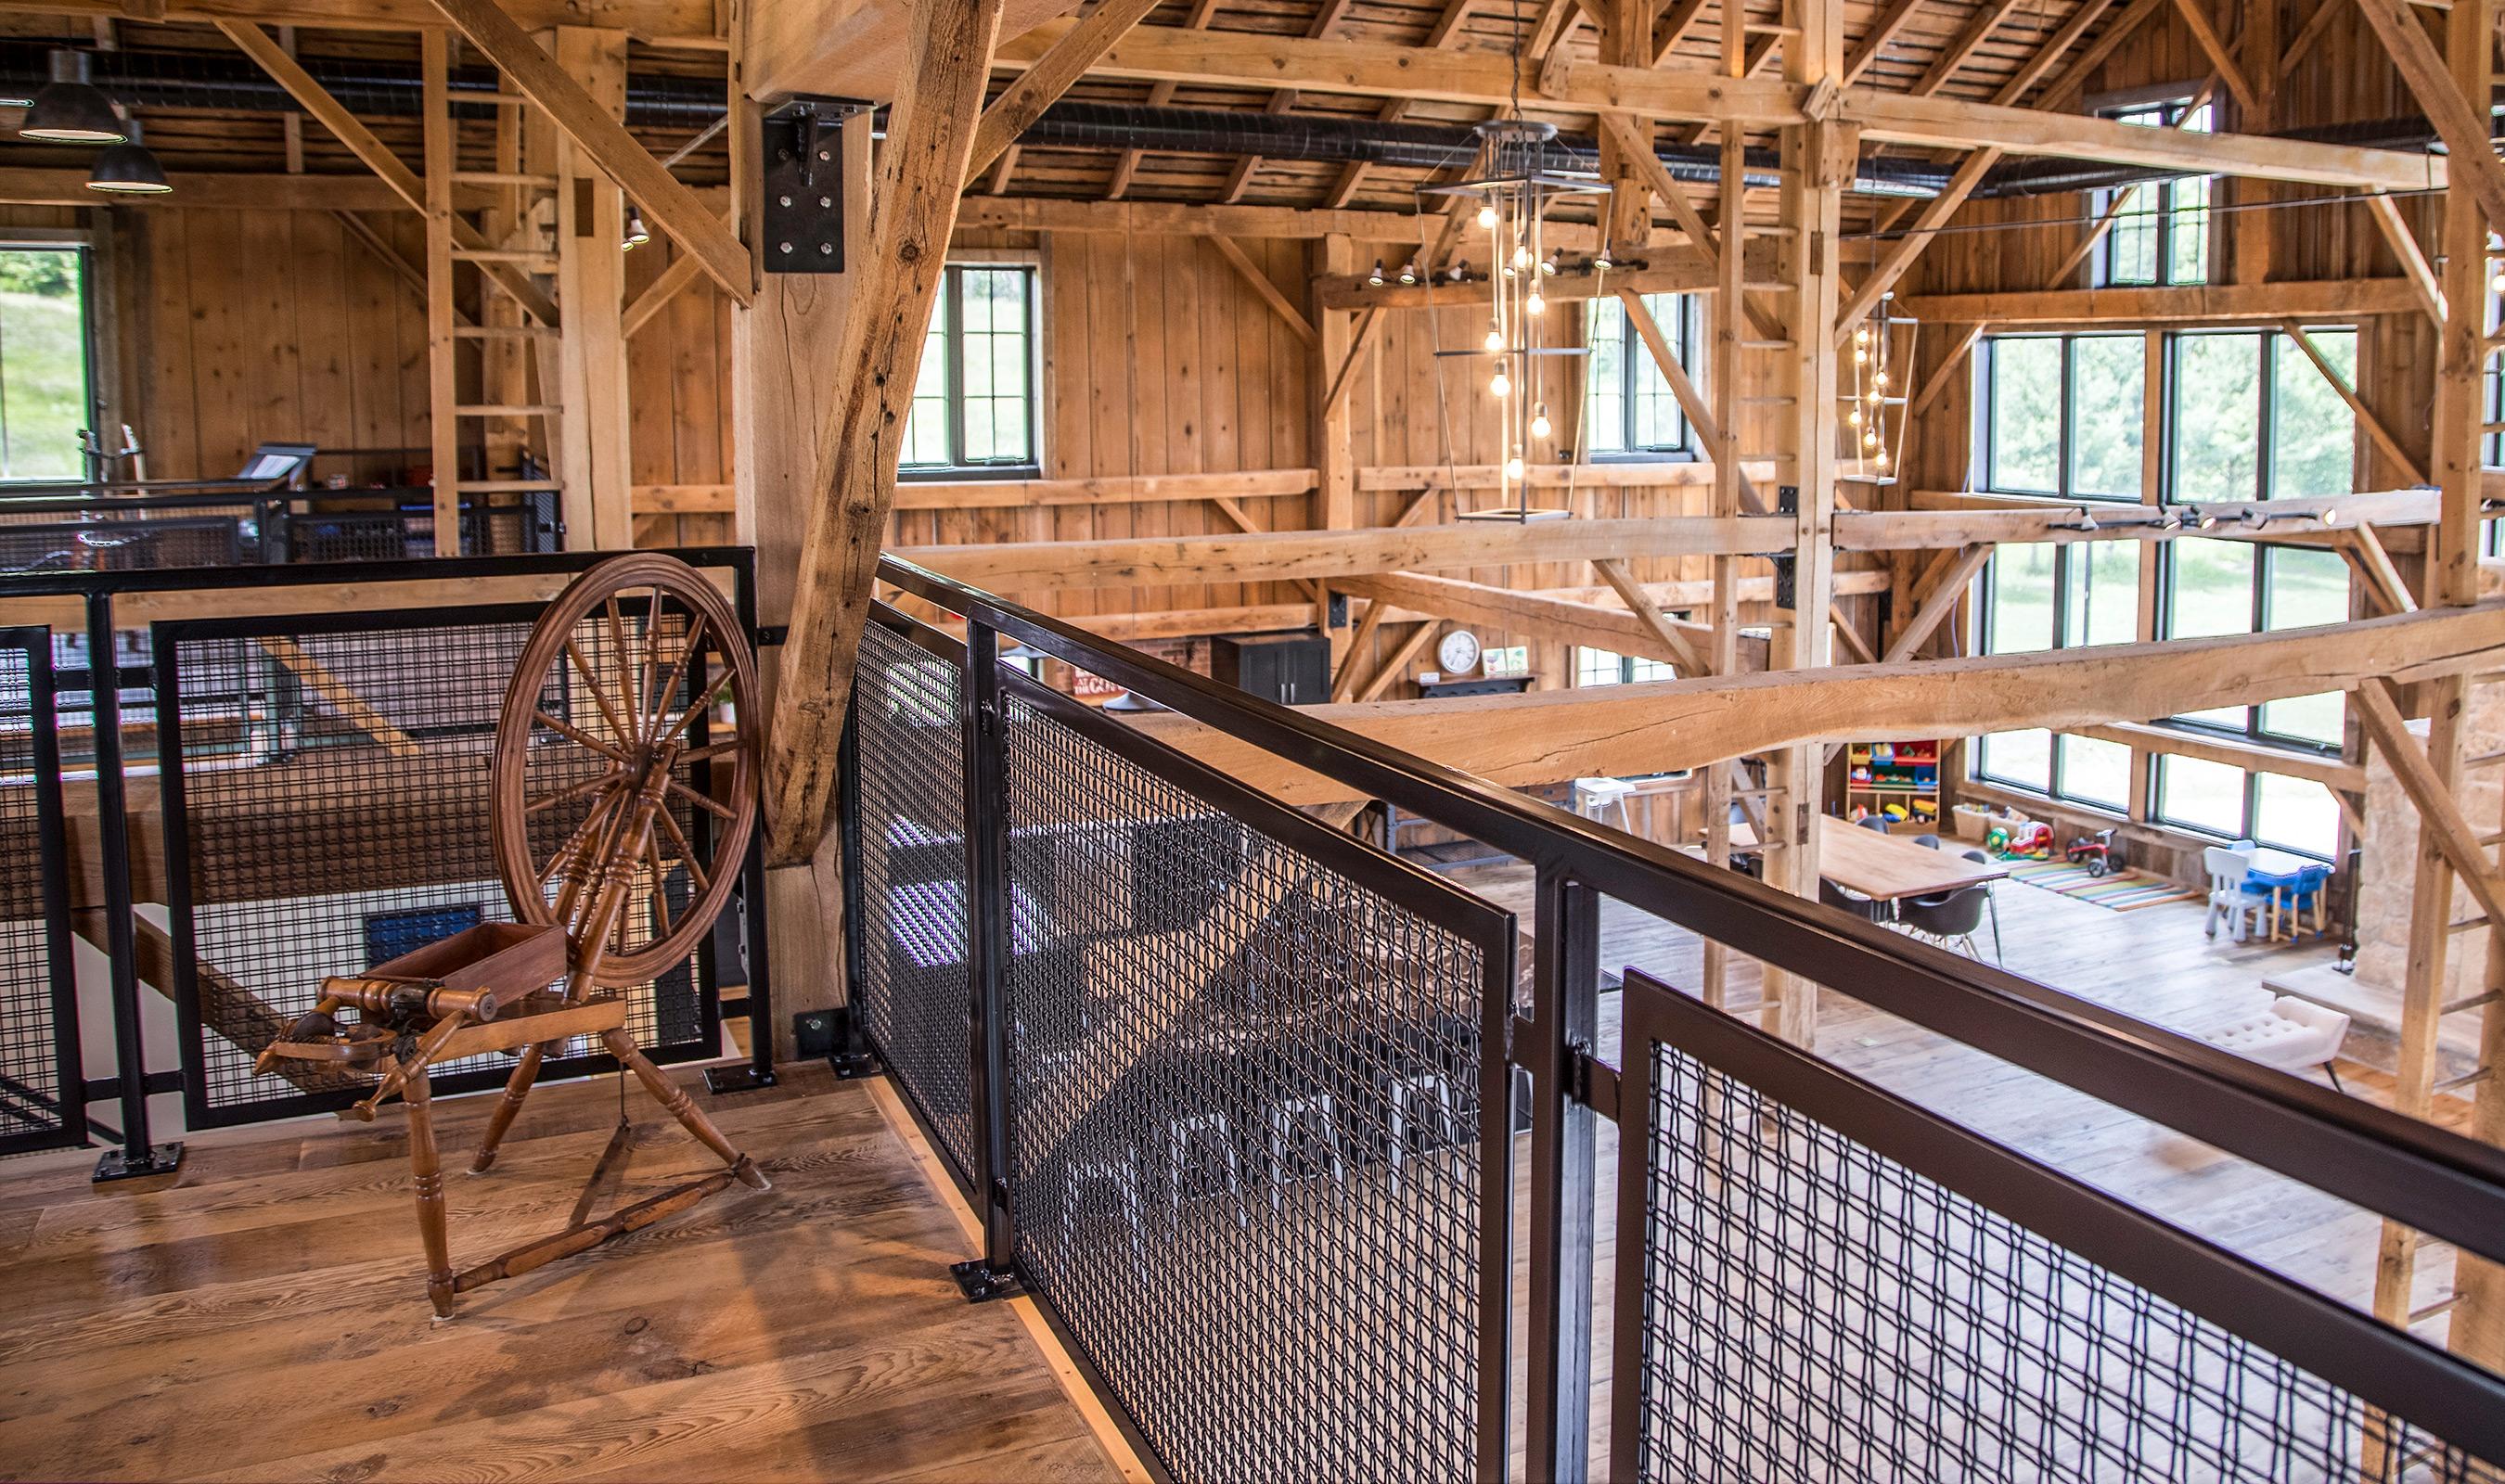 Barn Home wire mesh railing